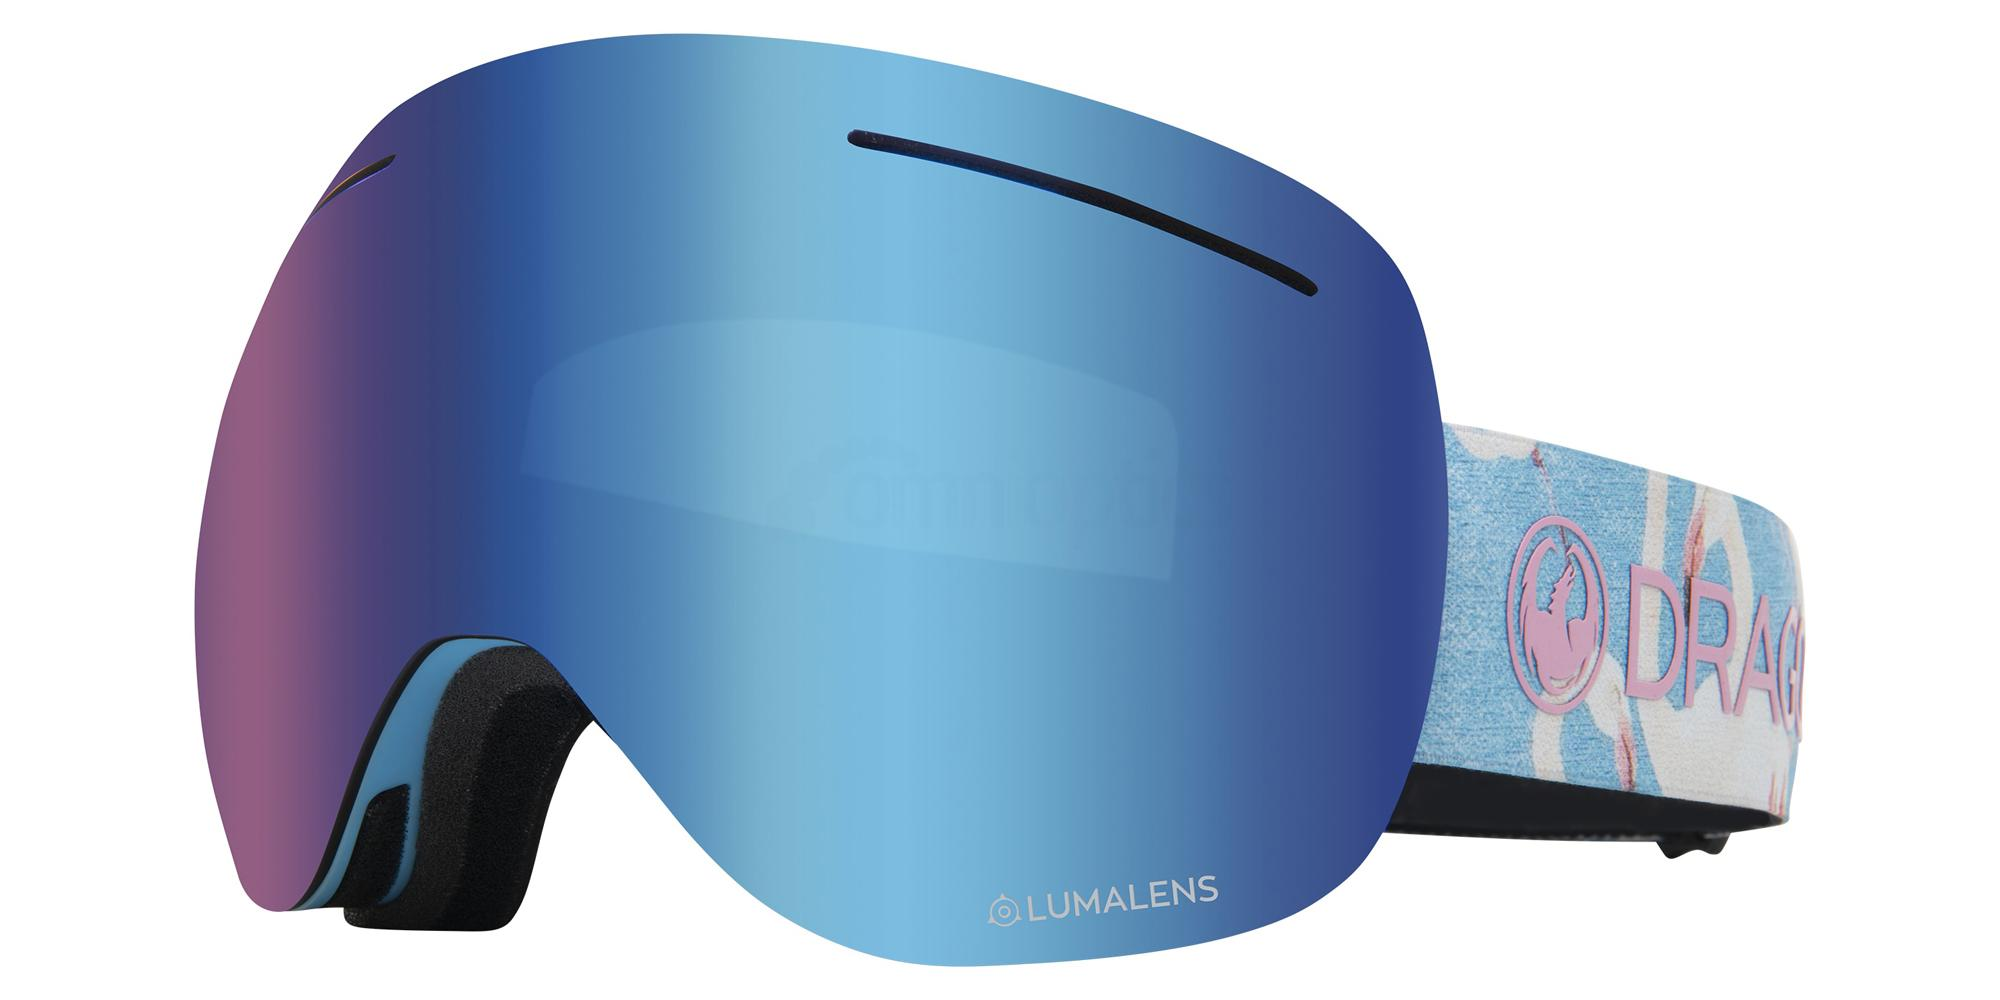 450 DR X1 BONUS Goggles, Dragon